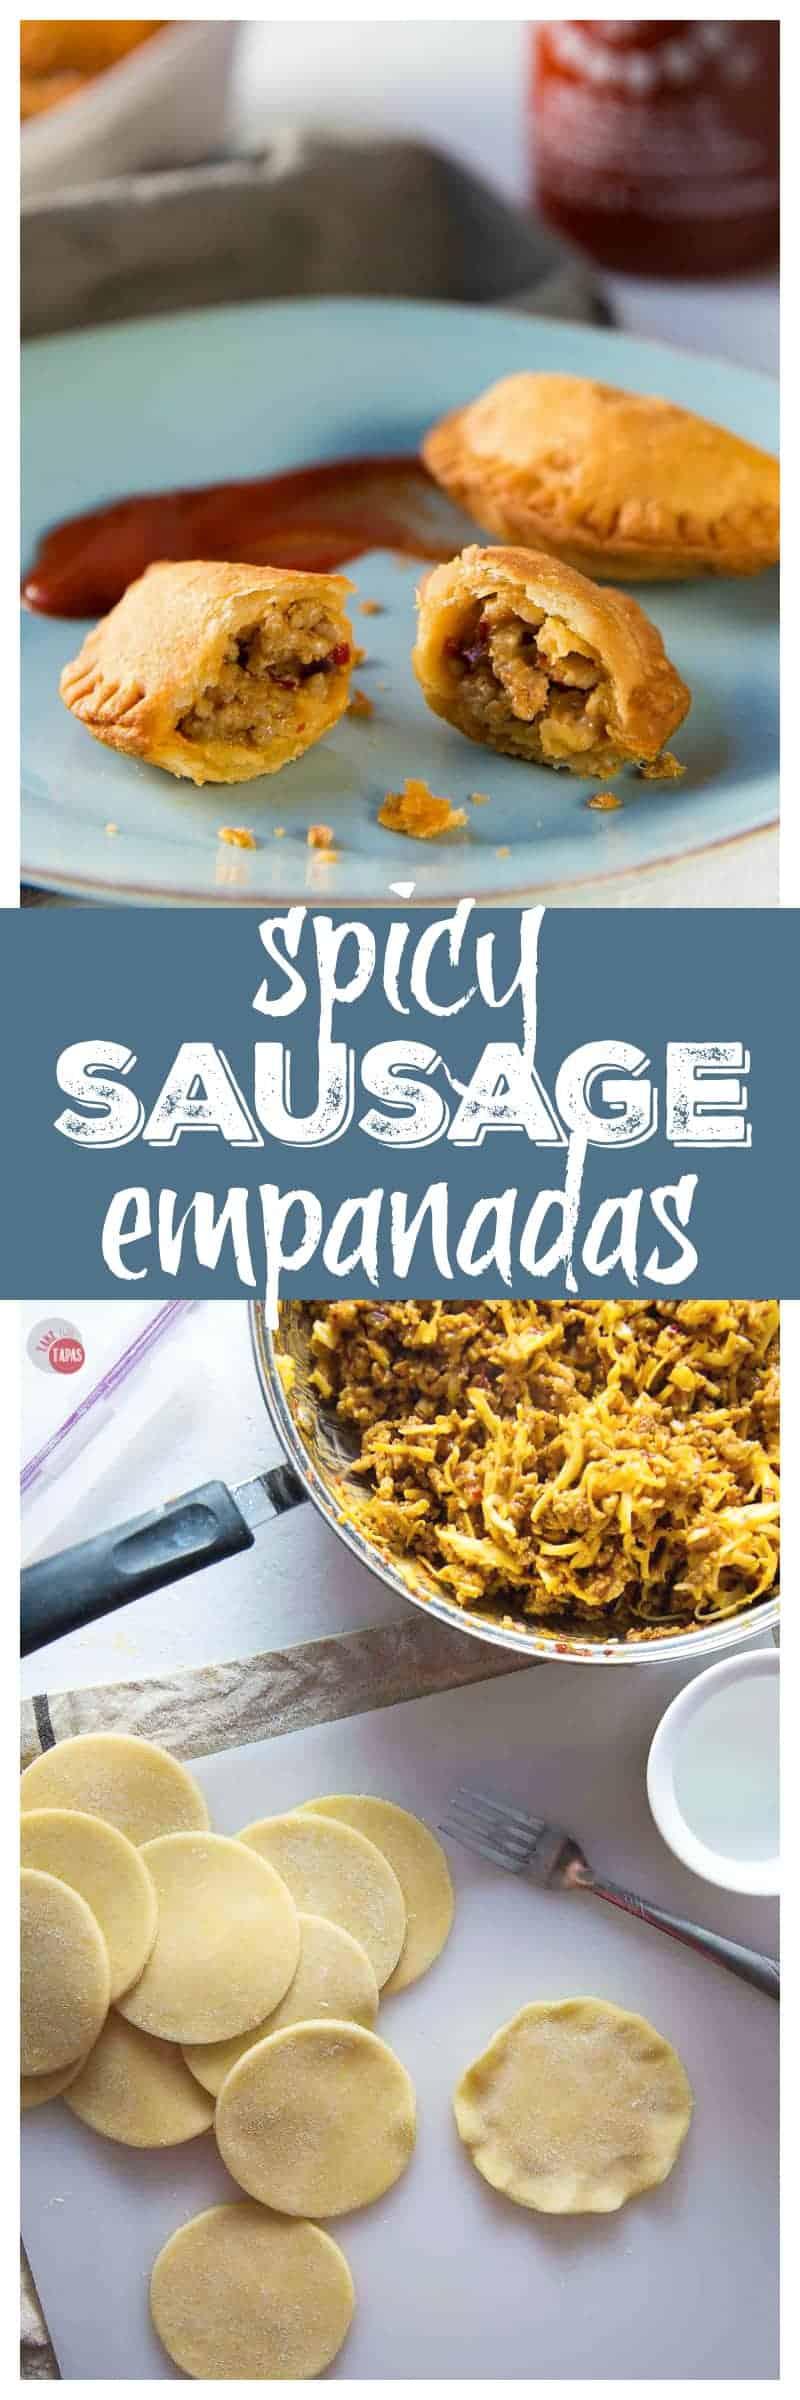 Addicting Spicy Sausage Empanadas | Take Two Tapas | #Spicy #Sausage #Empanadas #TheFlavorBender #Tapas